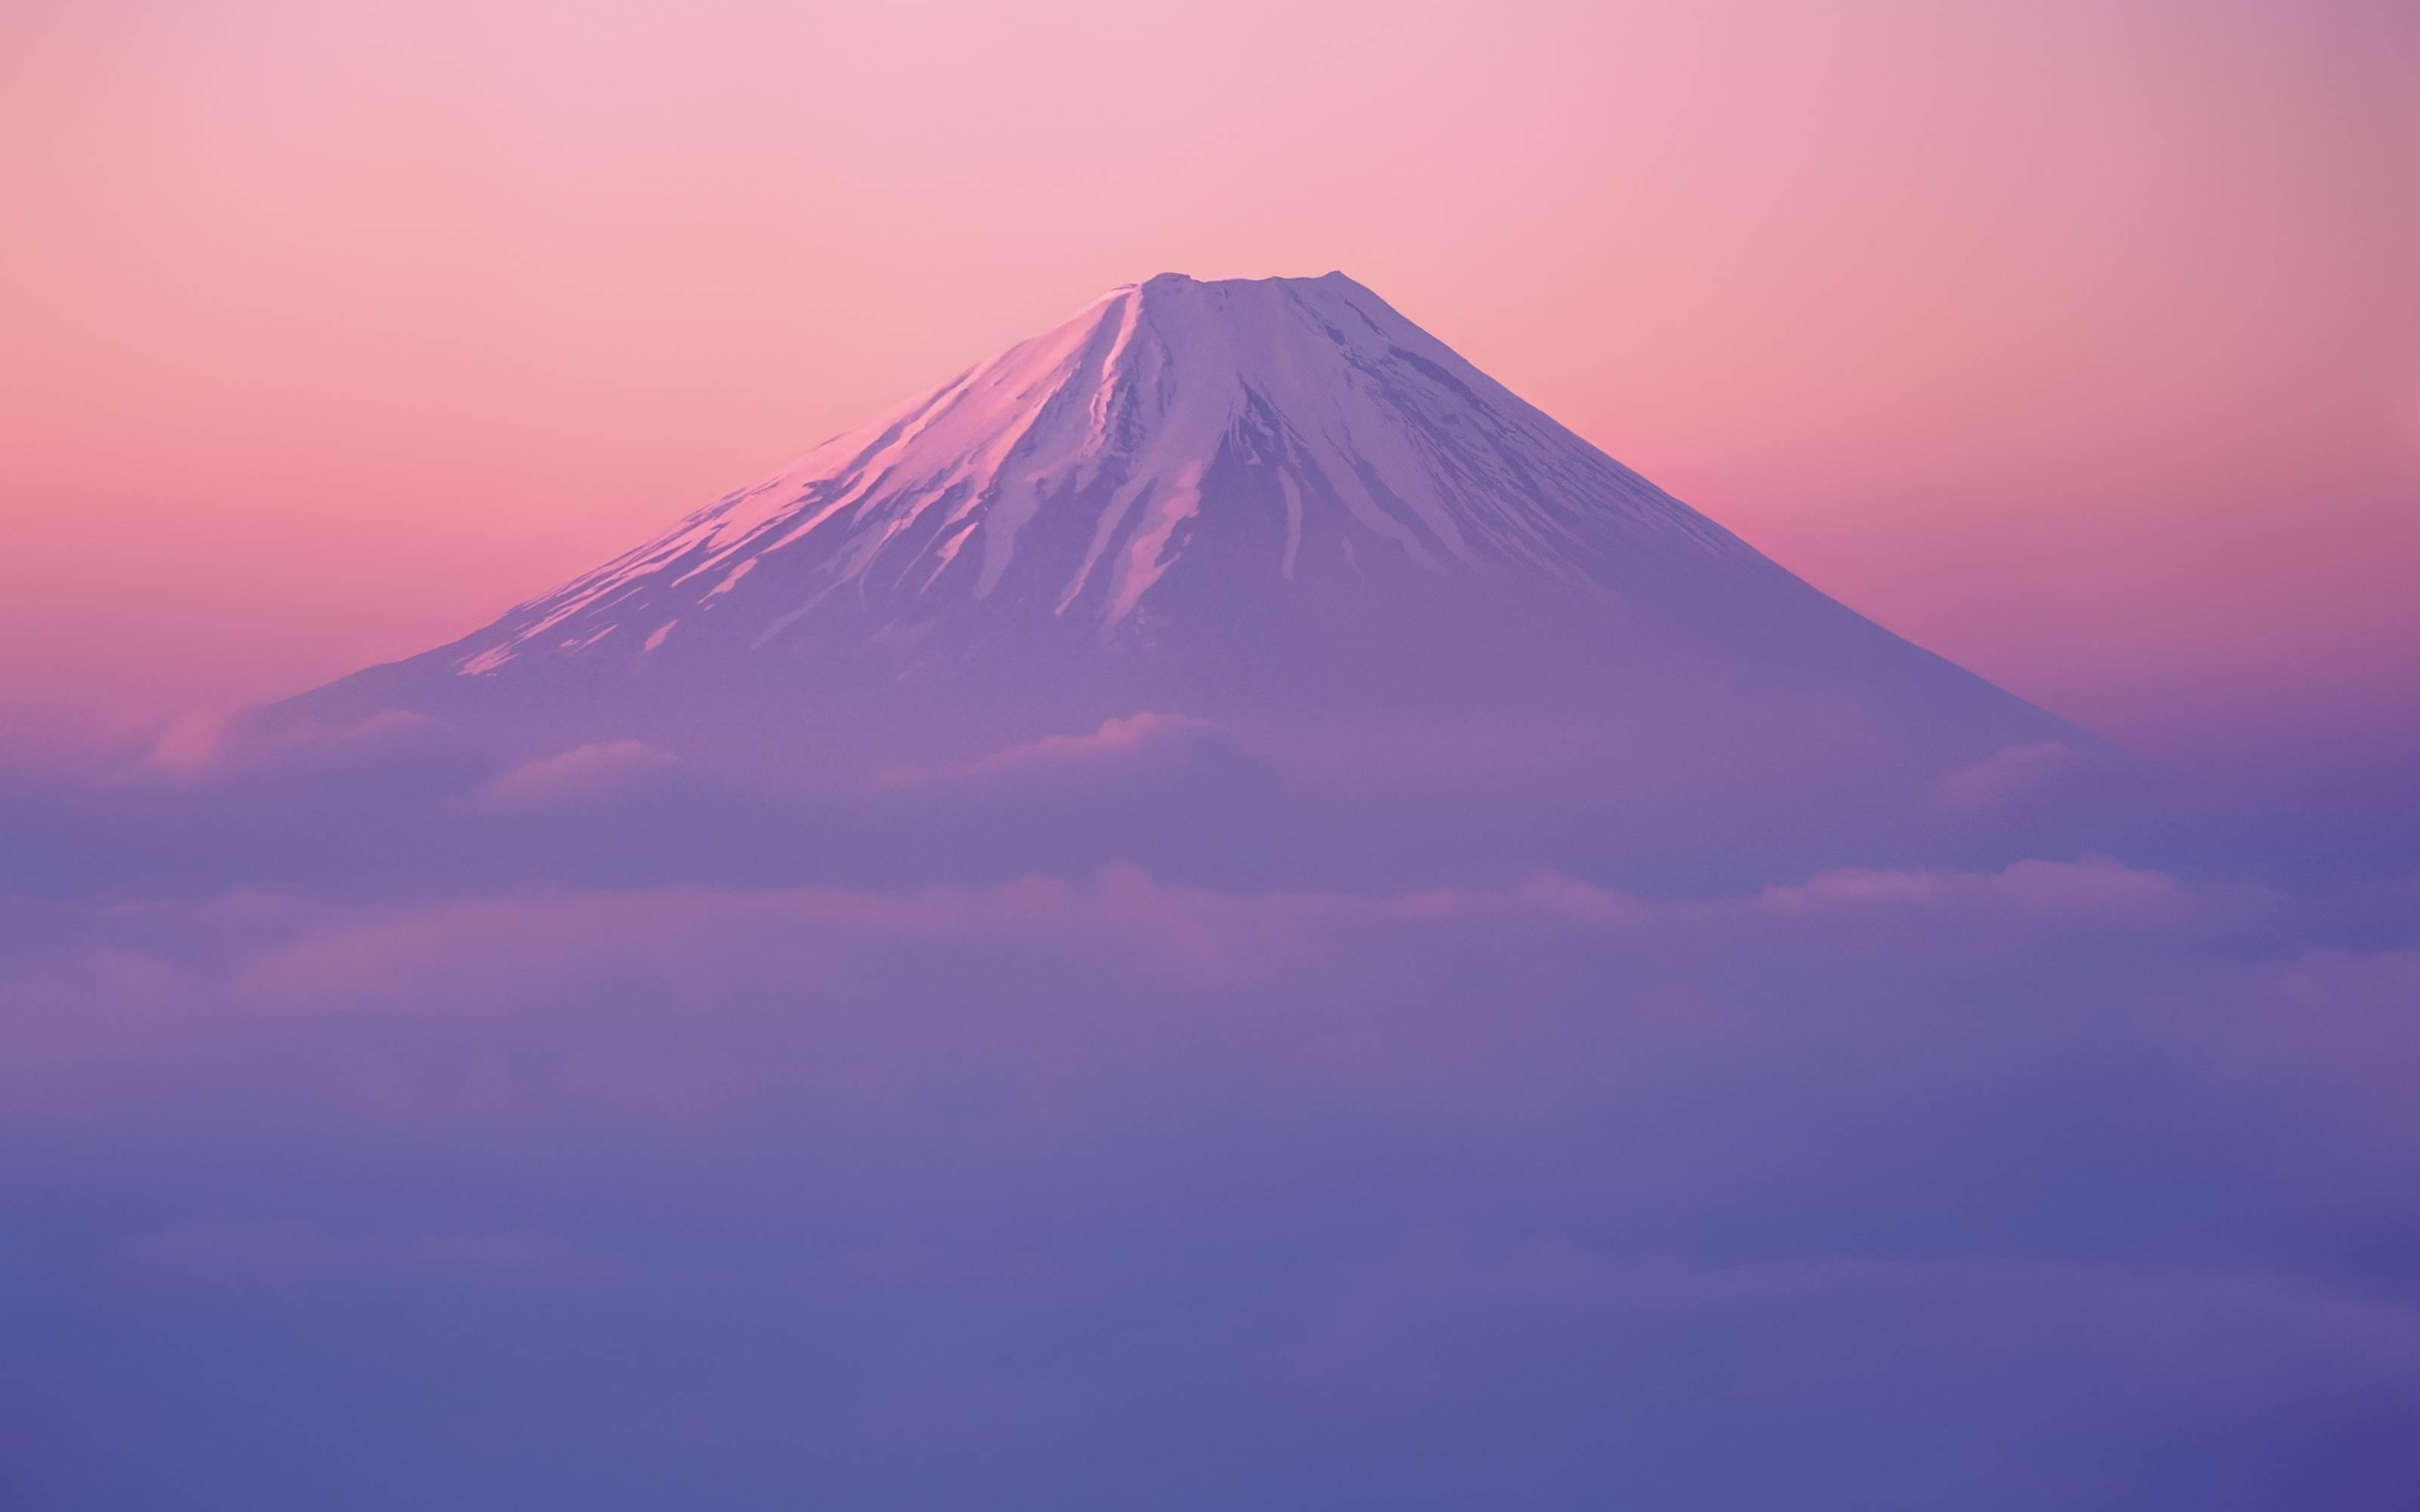 New Mt Fuji Wallpaper in Mac OS X Lion Developer Preview 2 OSXDaily 3200x2000